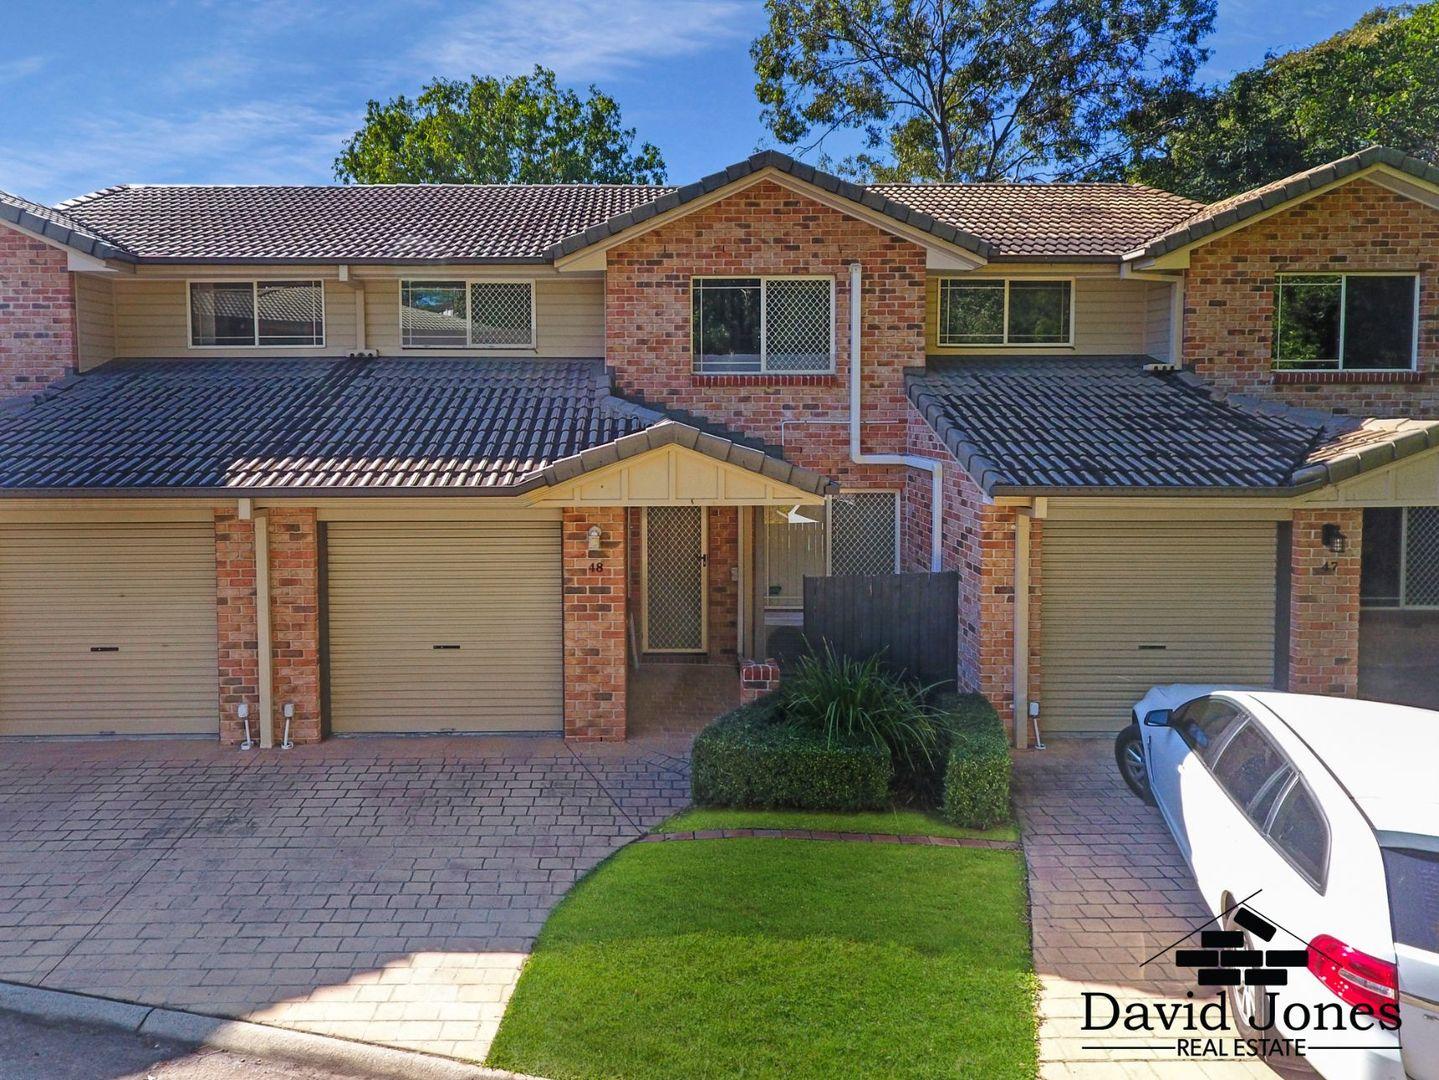 48 Hogan Place, Seventeen Mile Rocks QLD 4073, Image 0